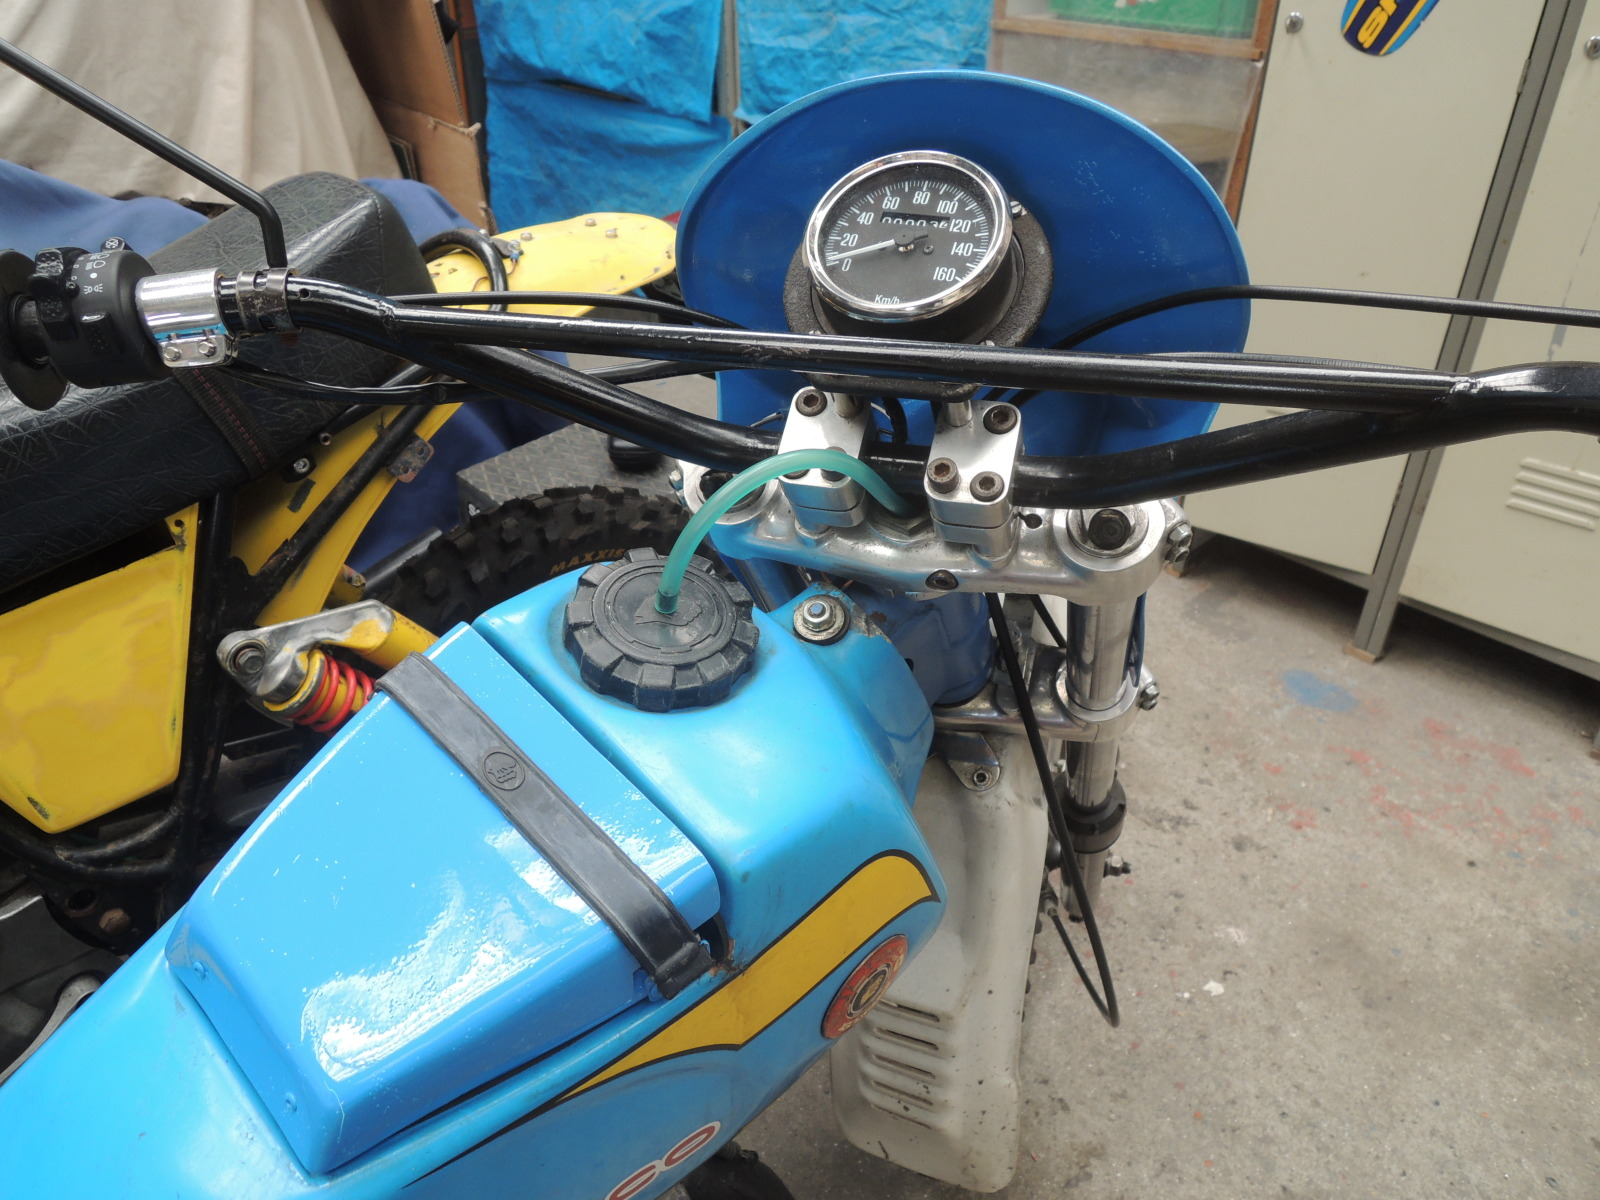 Bultaco Frontera MK11 370 - By Jorok - Página 2 14kgyg2